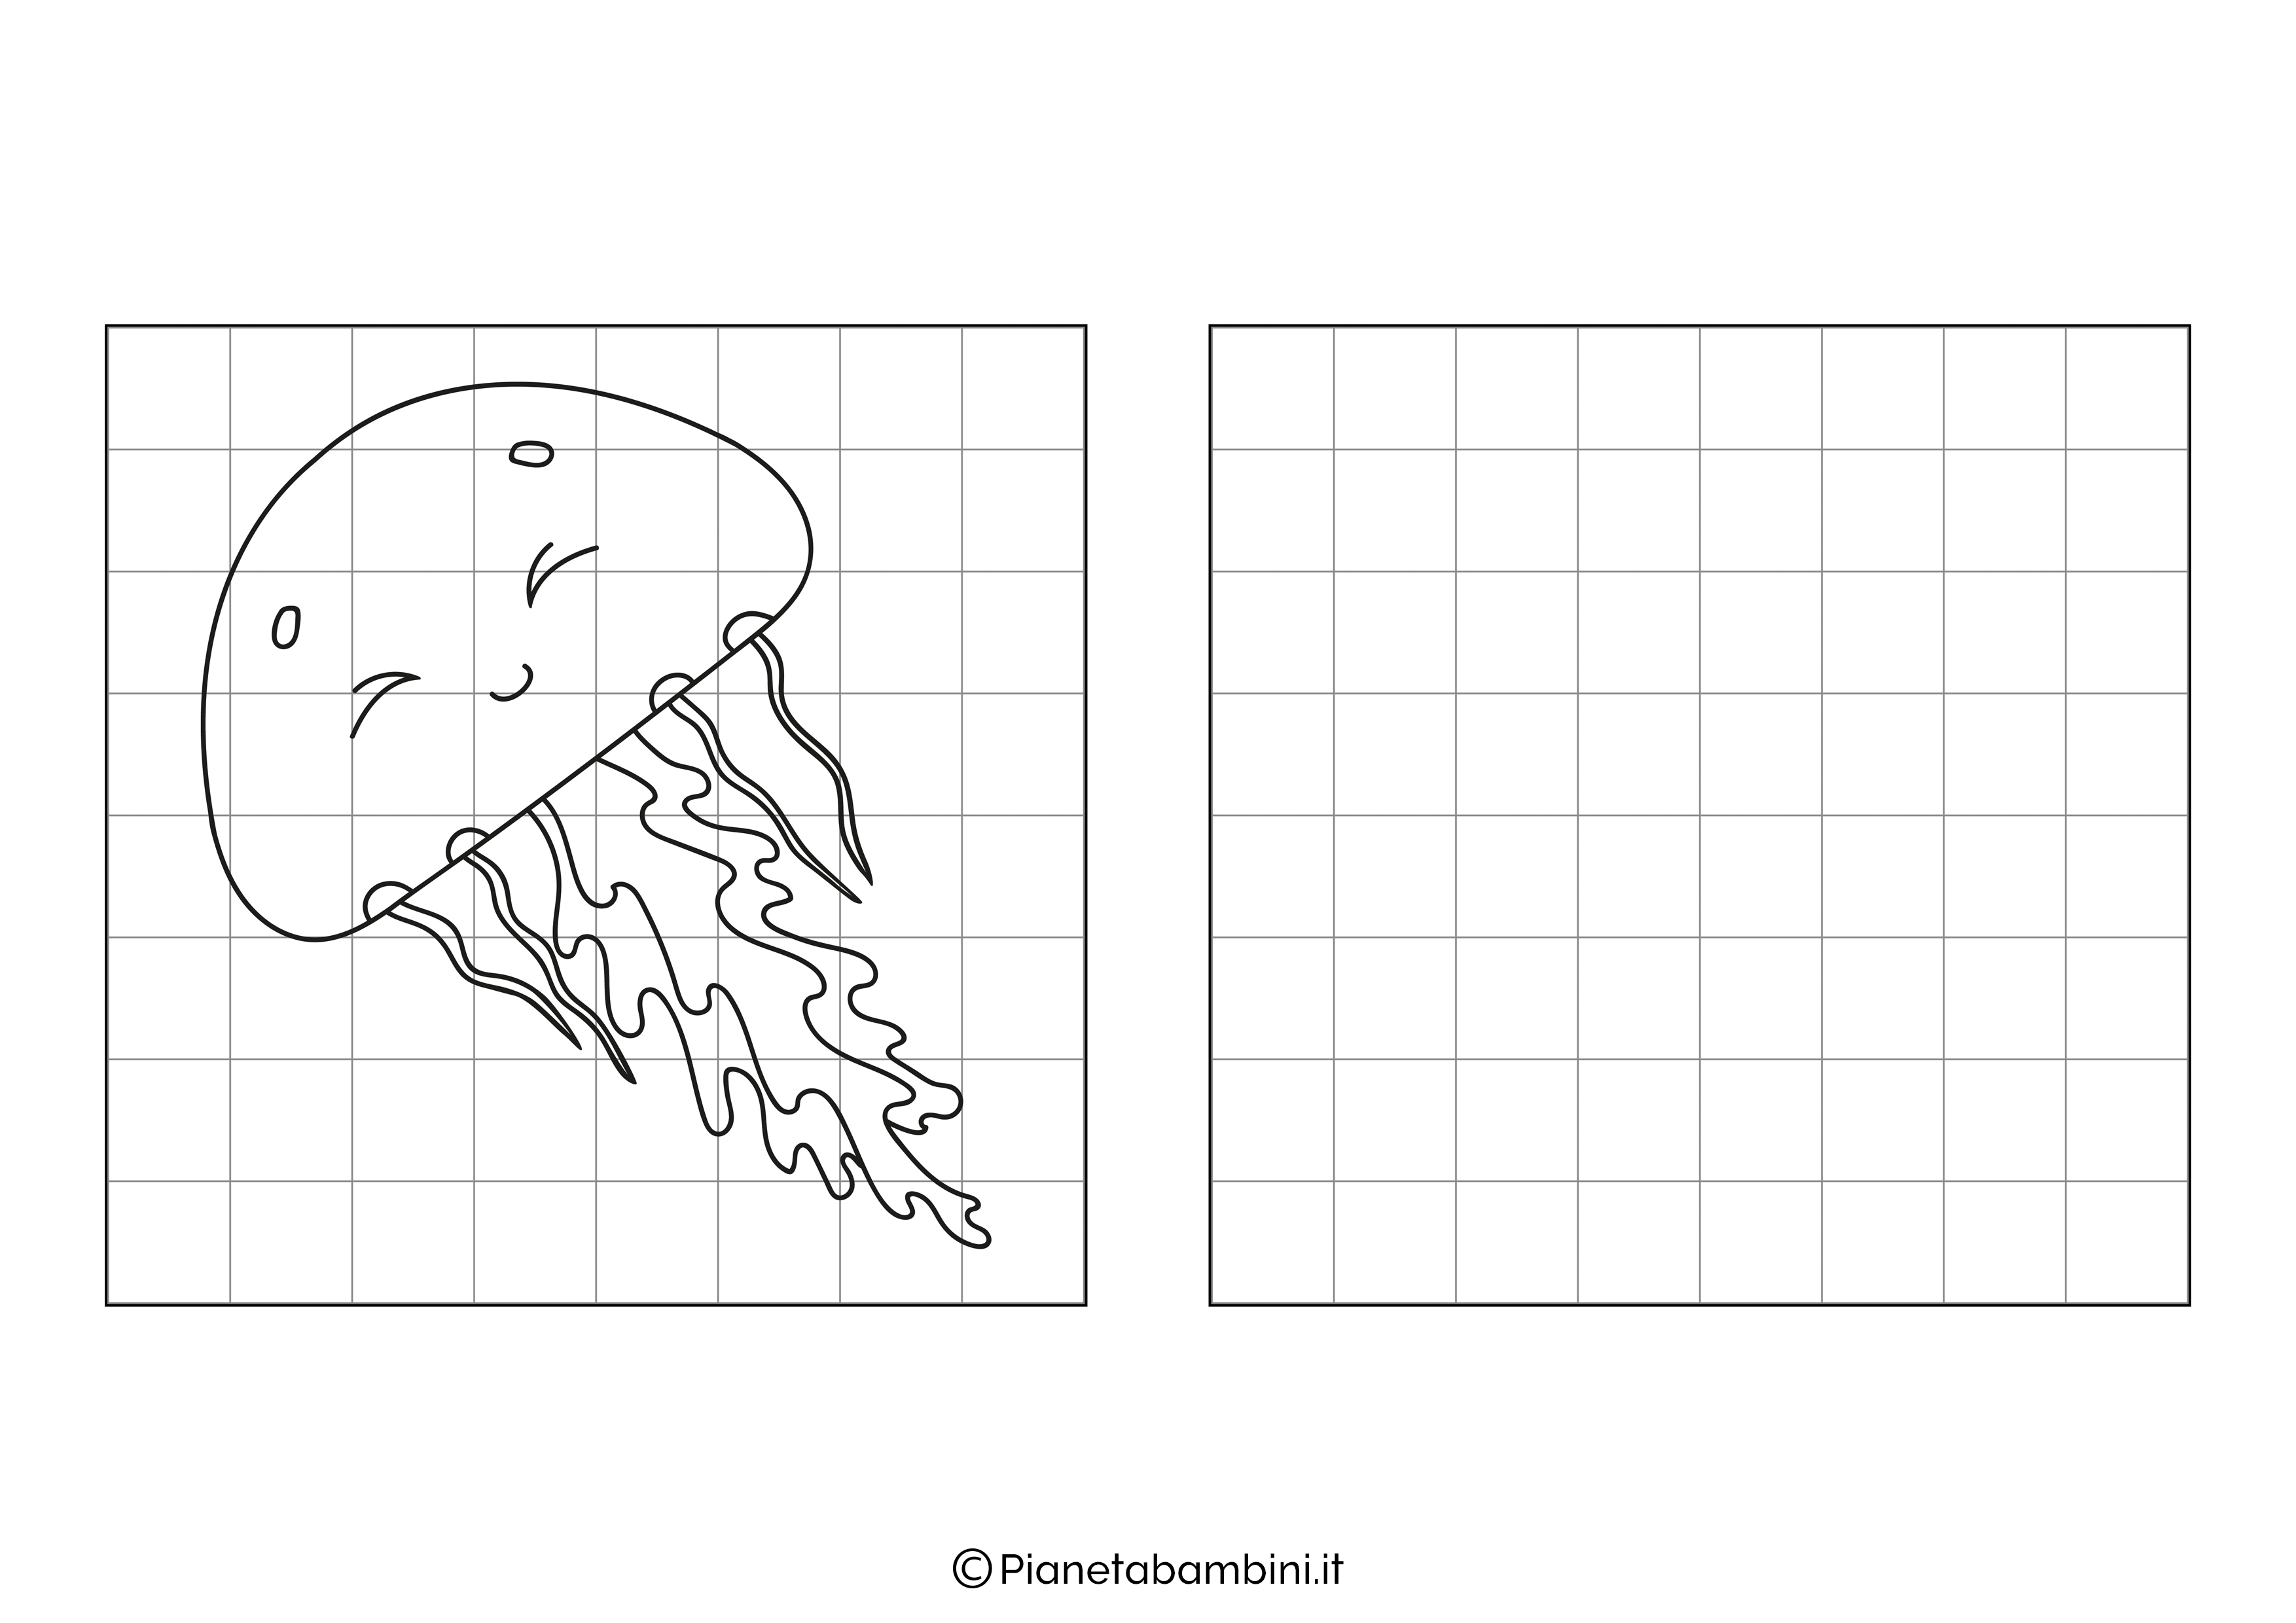 Medusa da copiare